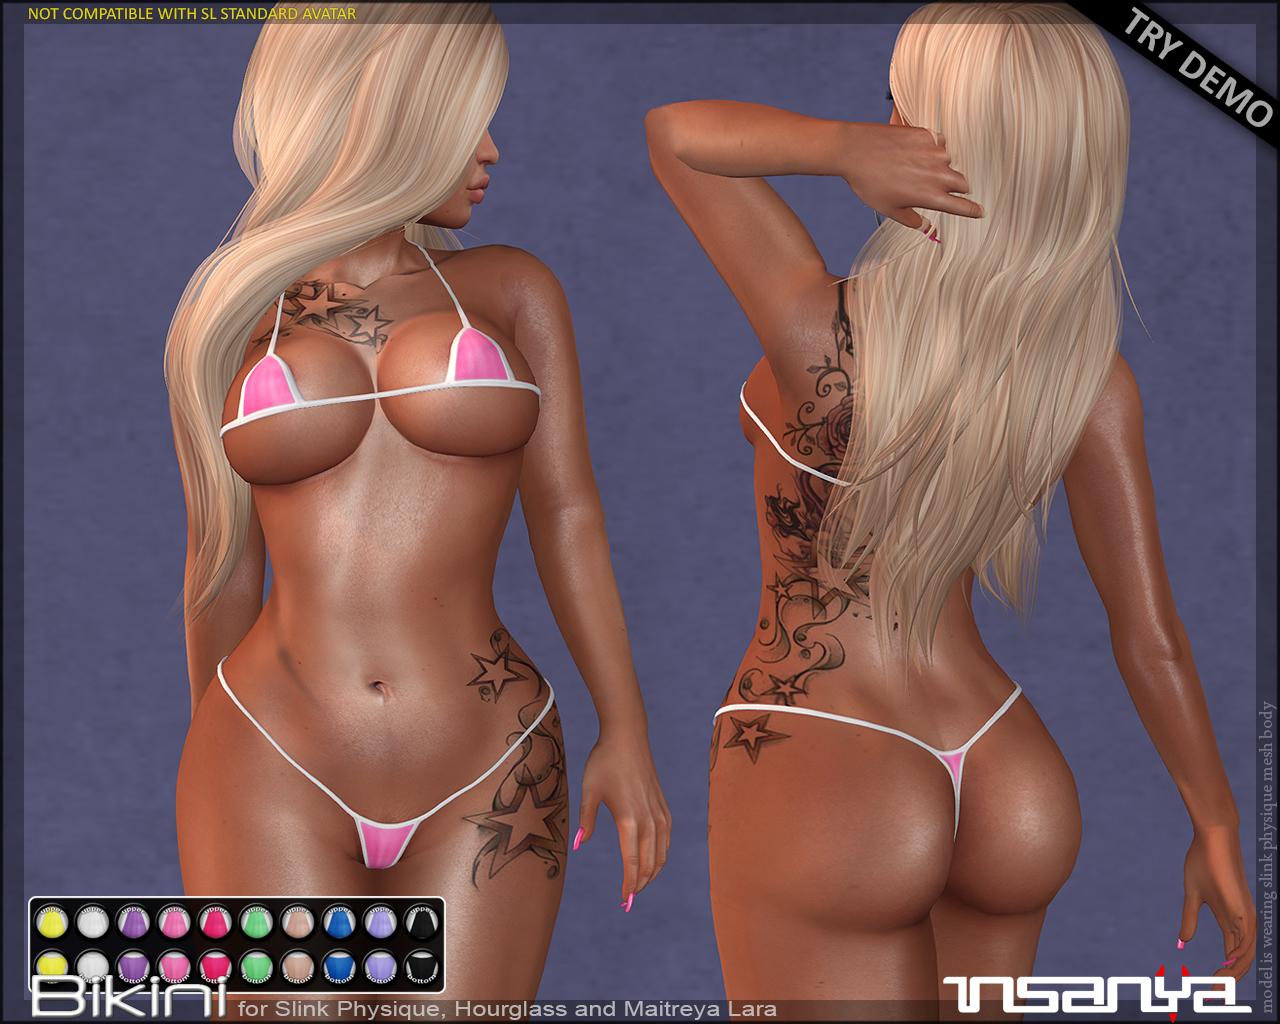 Insanya Bikini WhiteColor.jpg